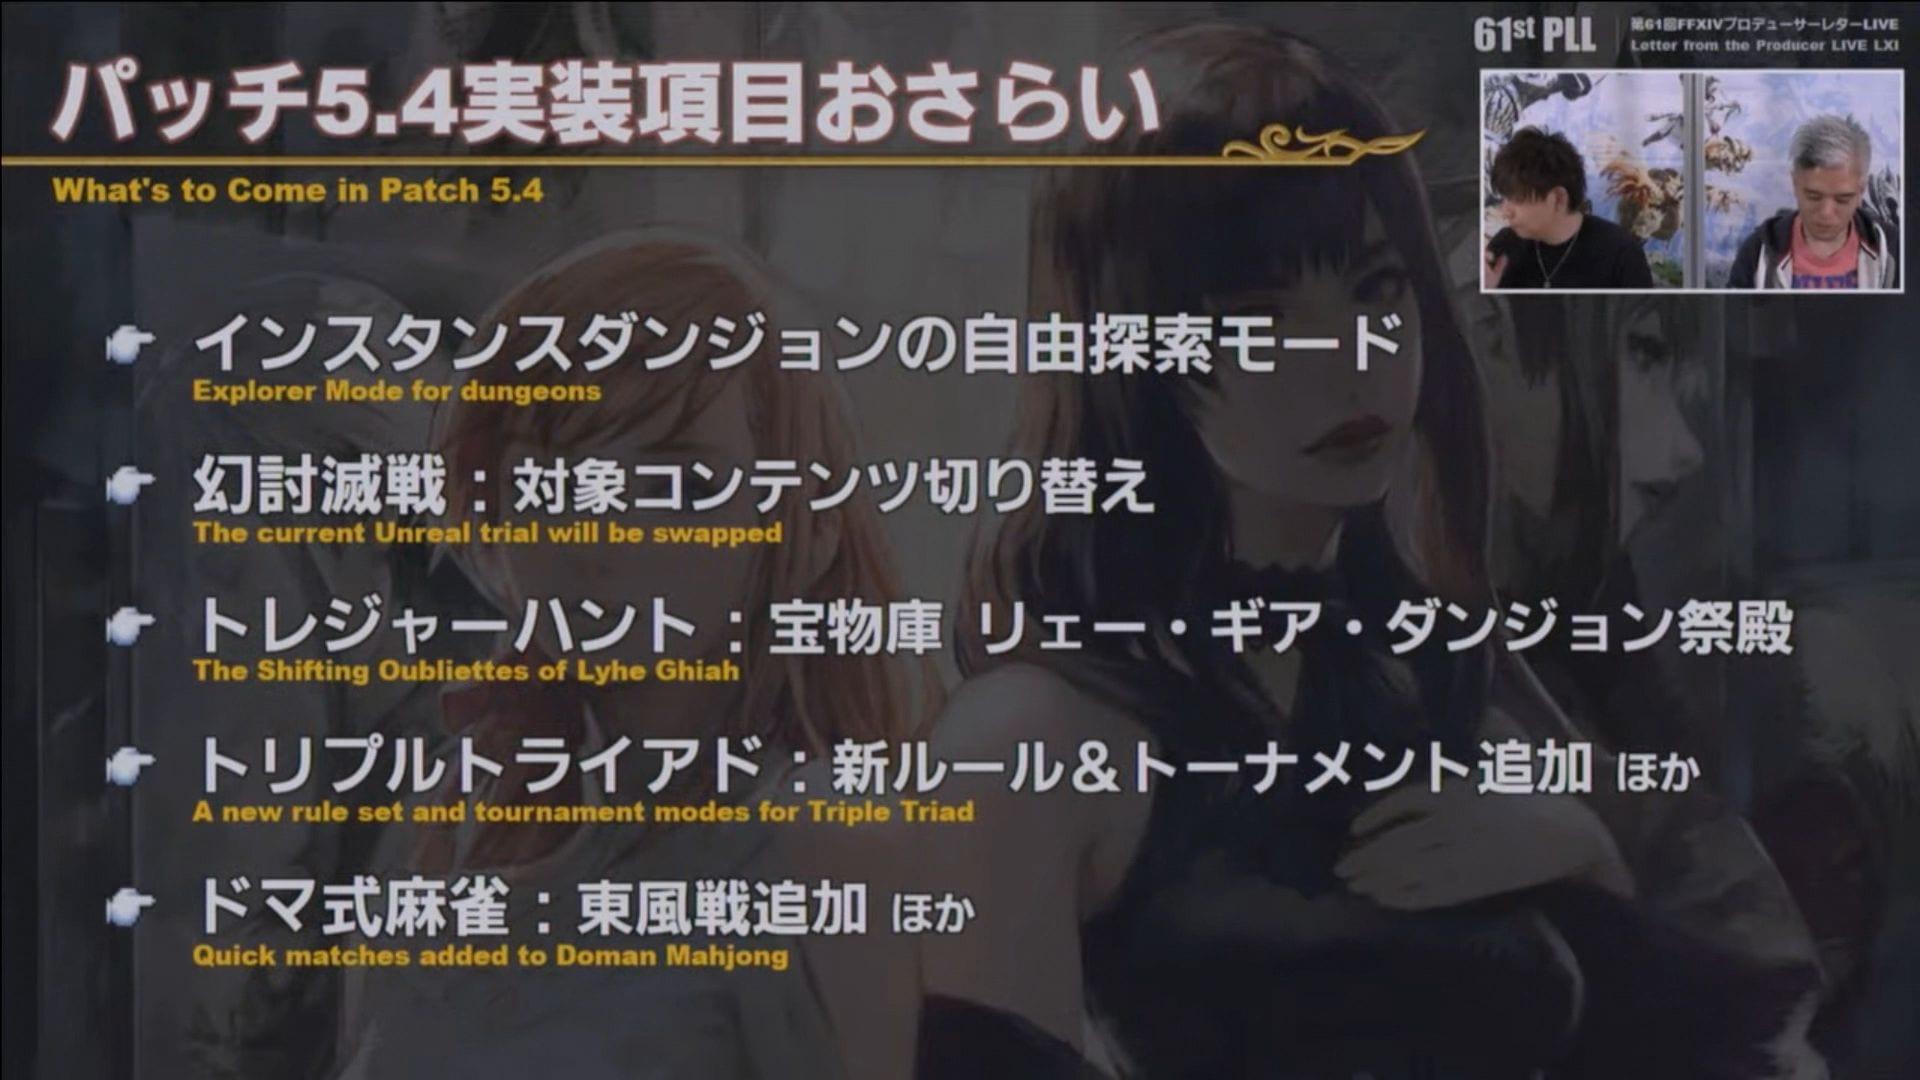 Final-Fantasy-XIV-Screenshot-2020-11-27-13-29-49.jpg